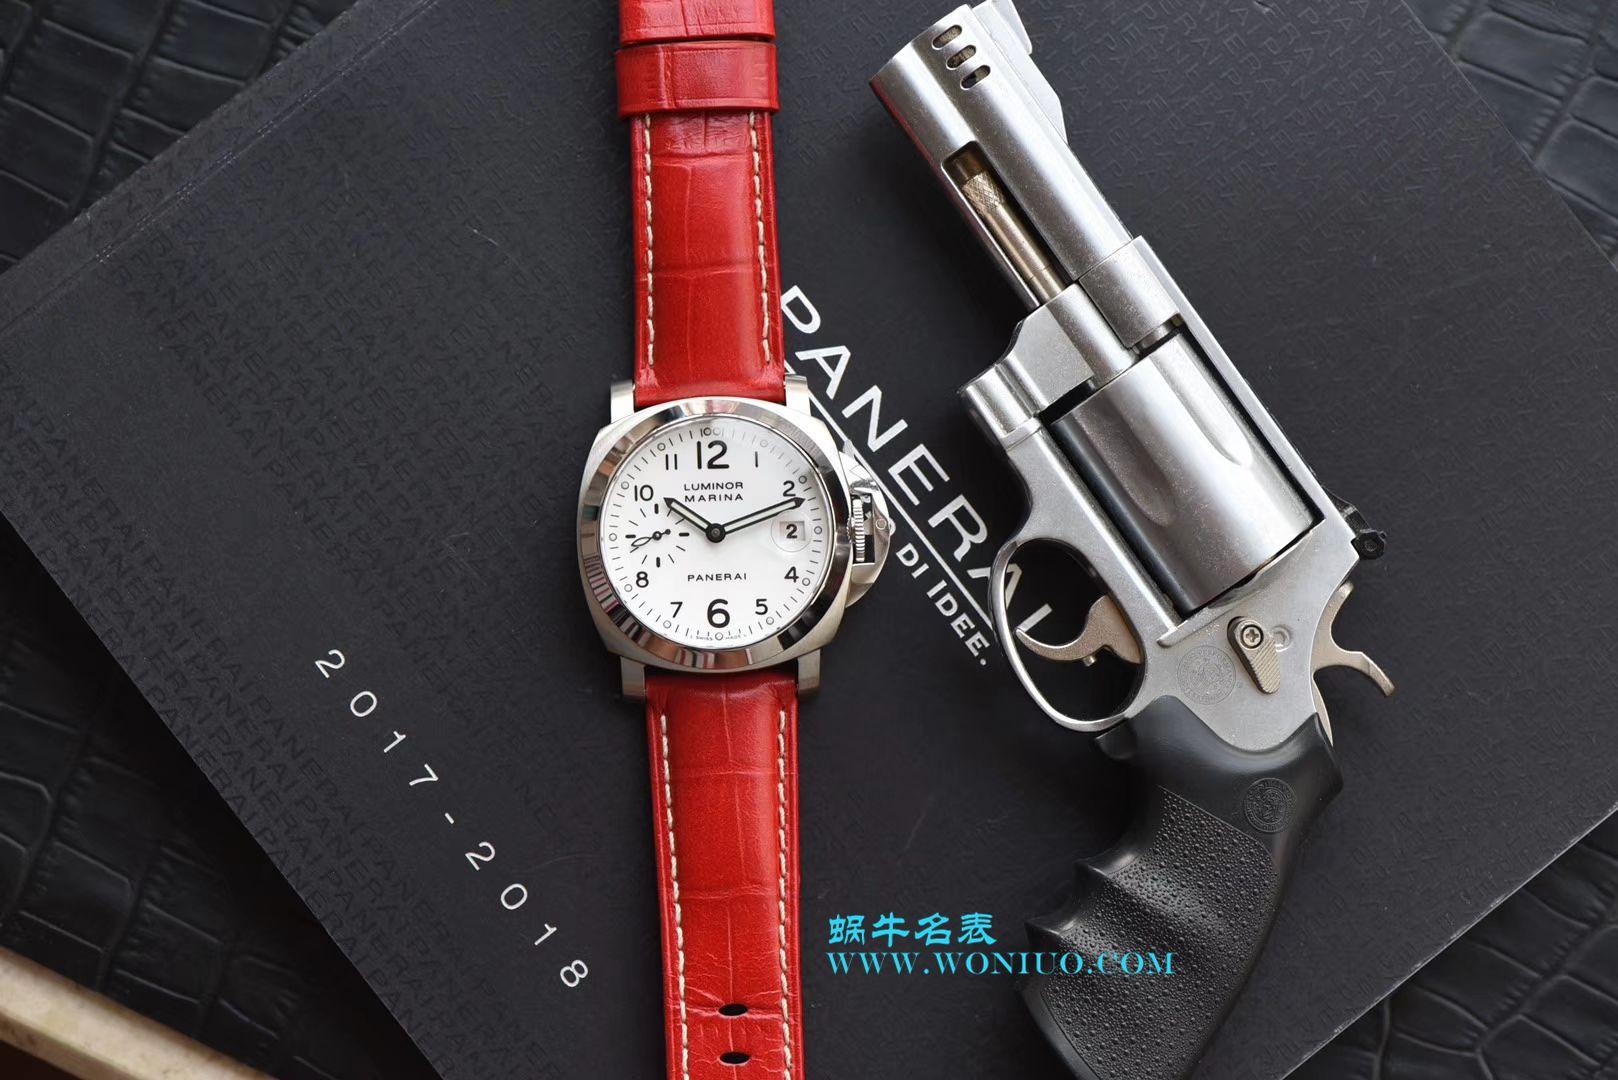 【XF一比一超A高仿手表】沛纳海LUMINOR系列PAM00049小盘女士腕表 / XFPAM049